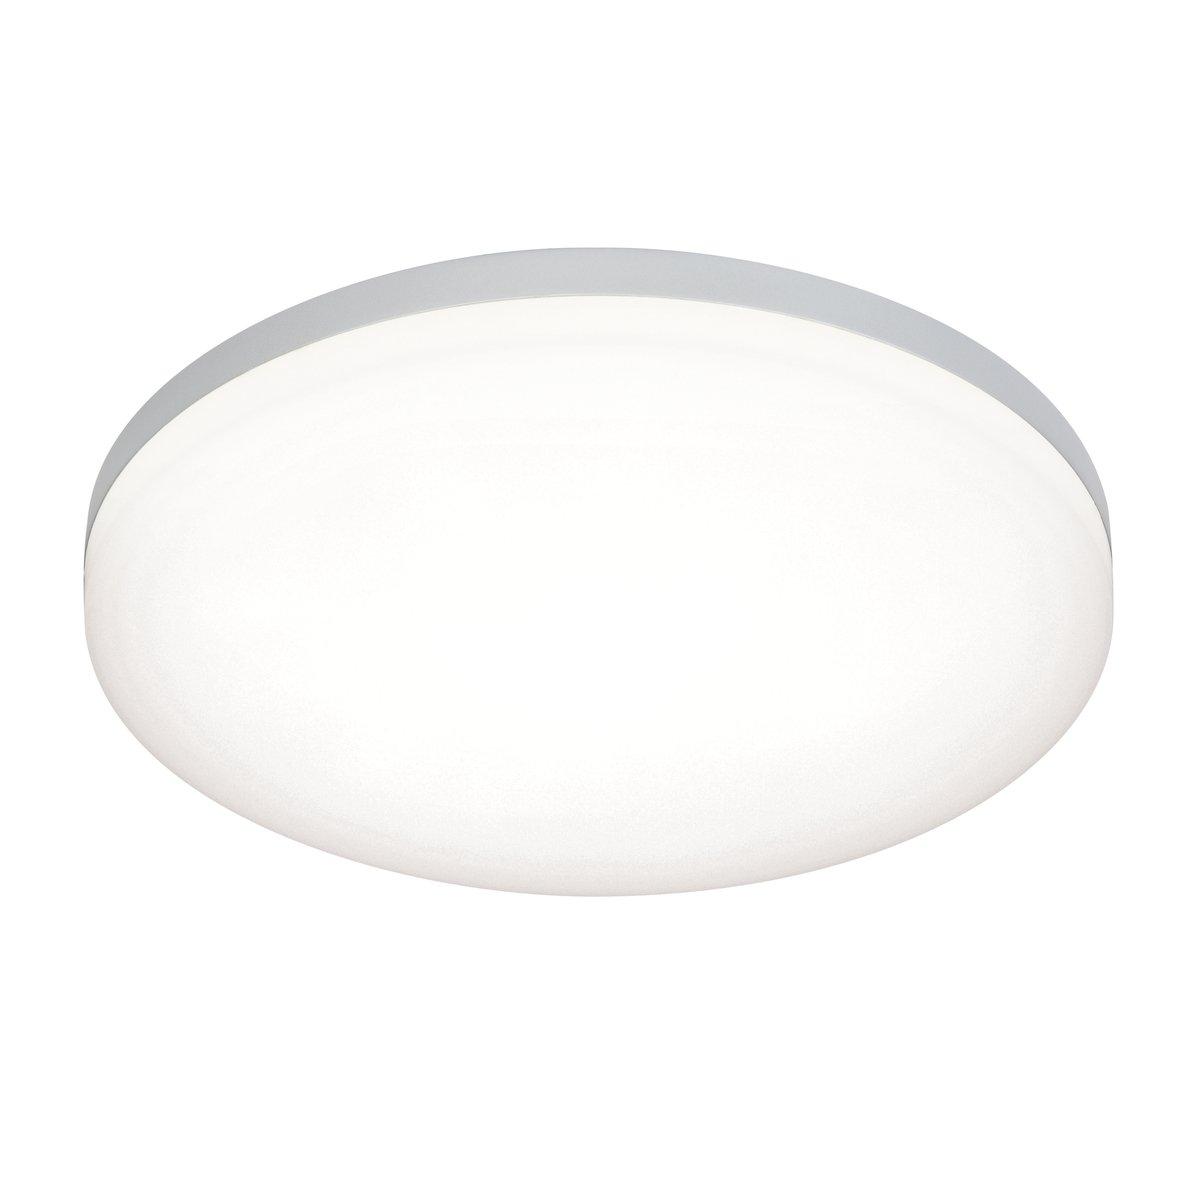 Modern 22W Super Slim Round Flush SMD LED 1900 Lumens Bathroom Ceiling Light IP44 Rated [Energy Class A] National Lighting